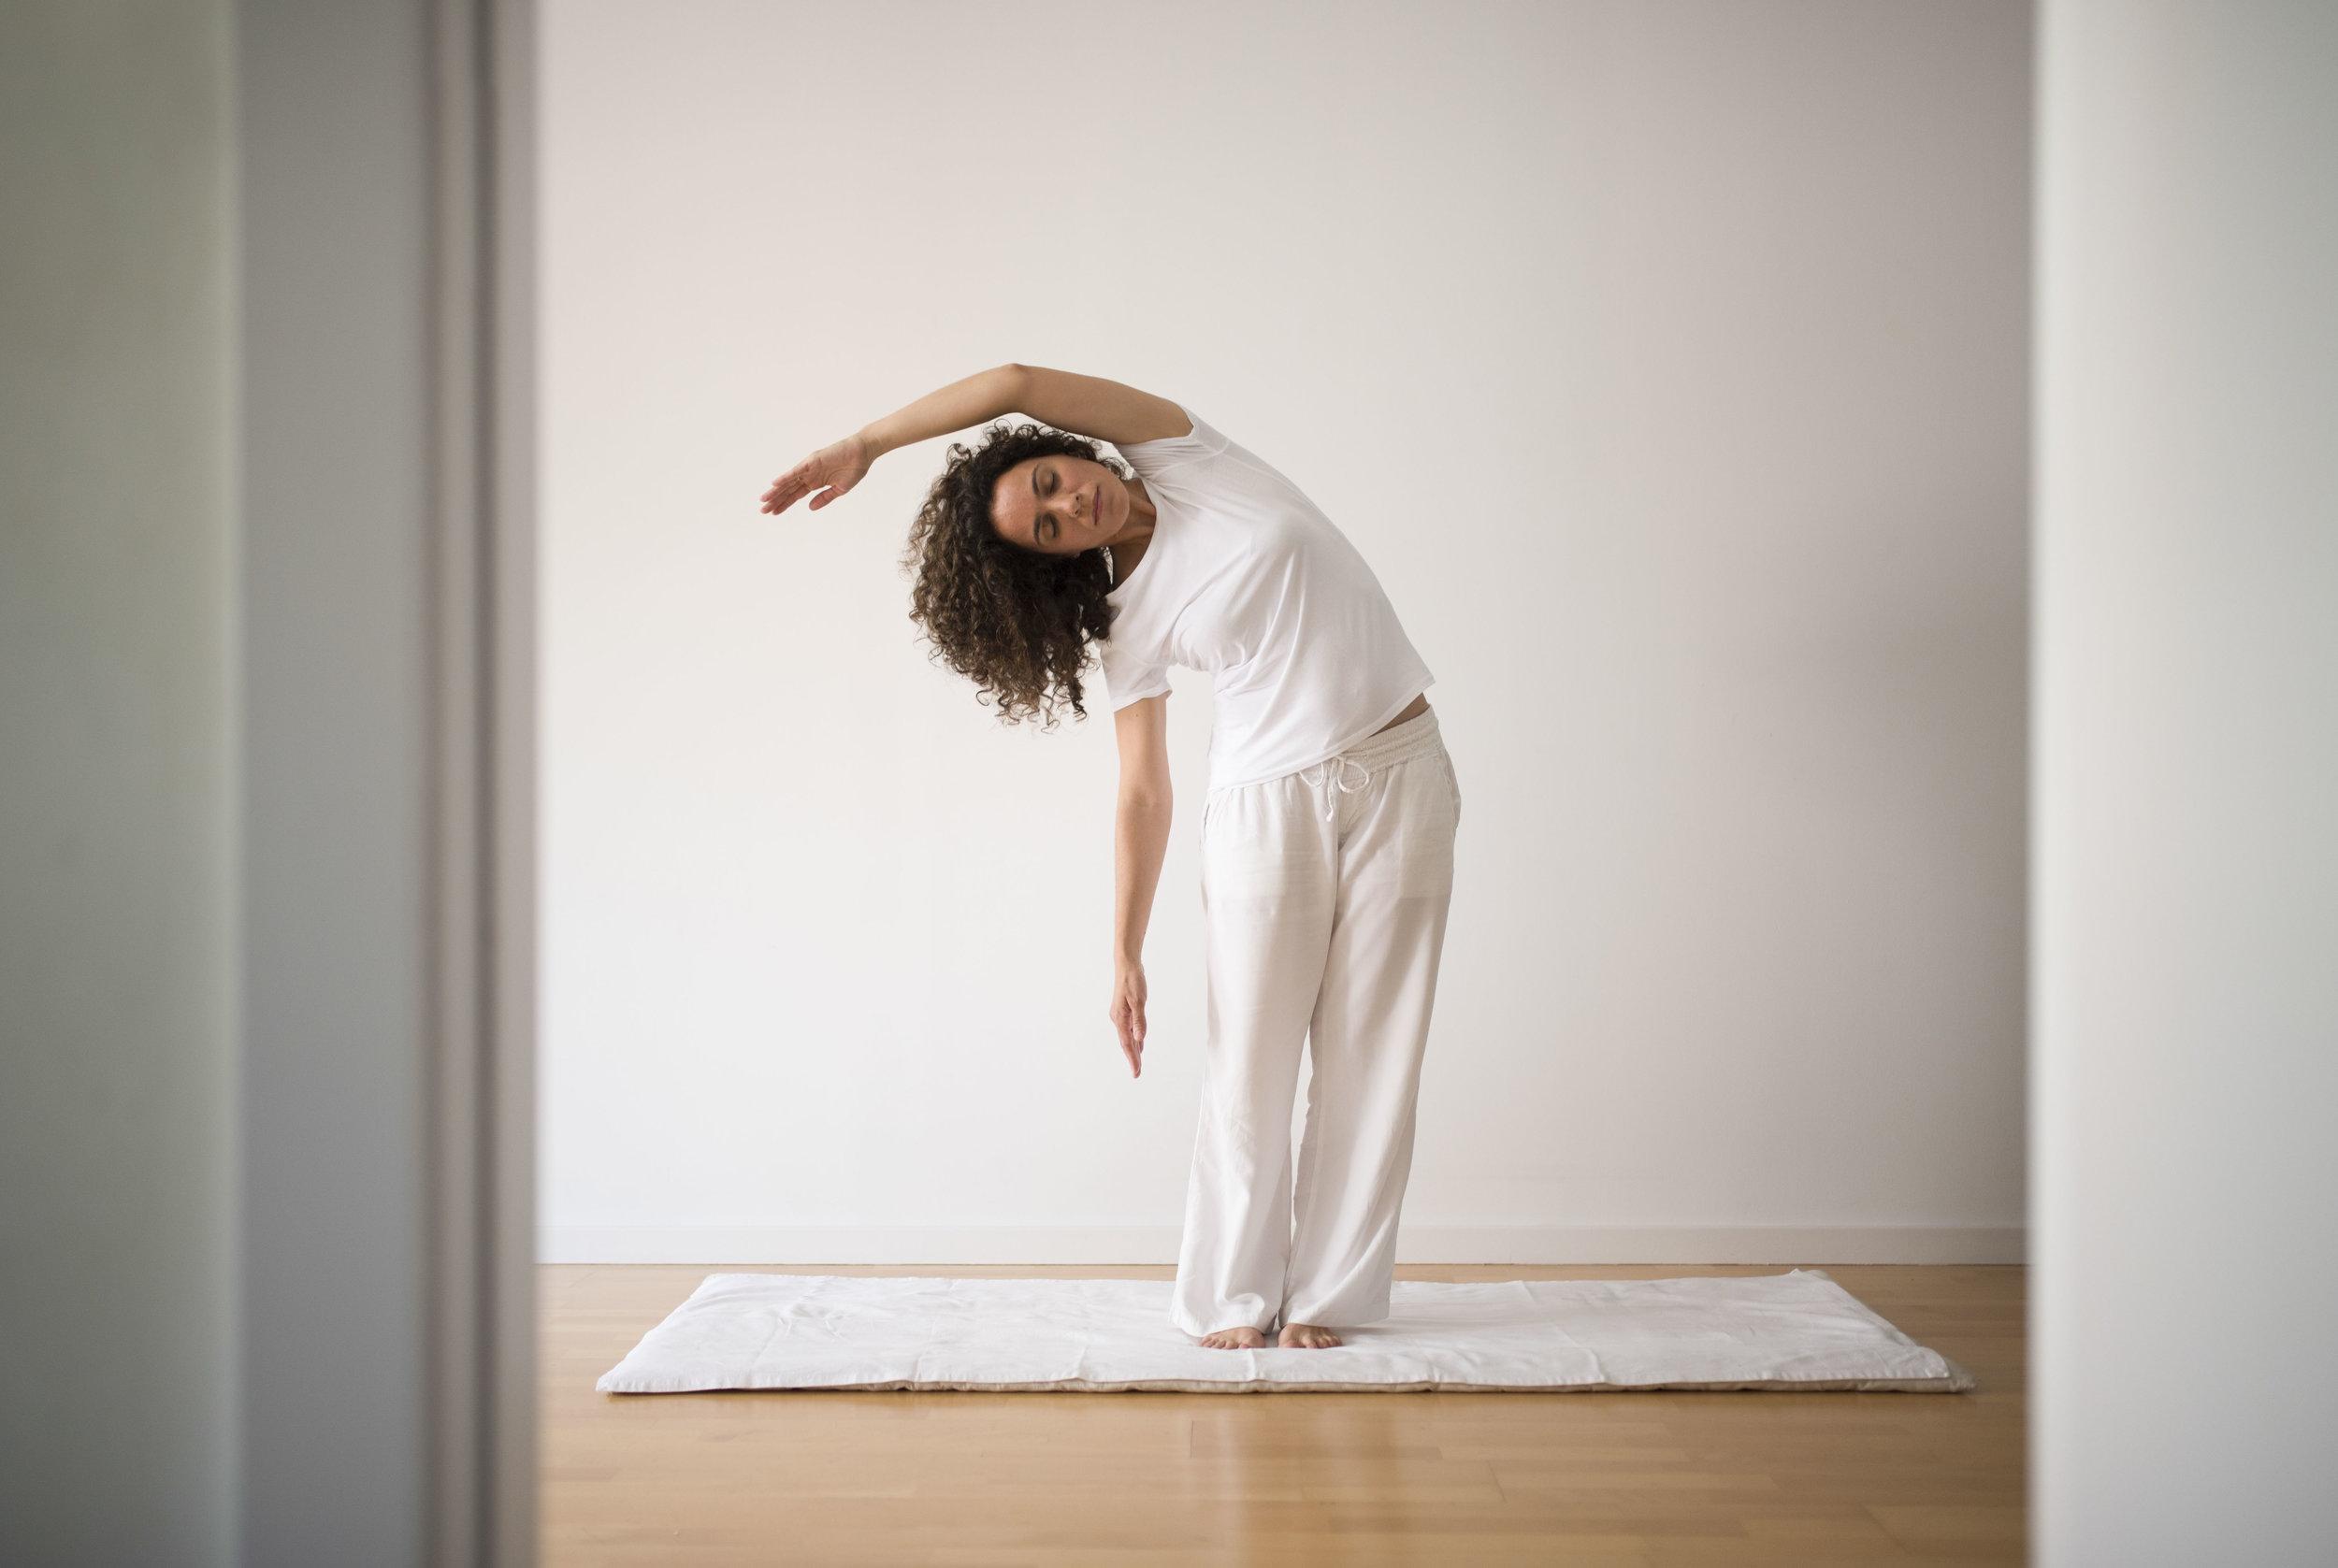 Nuria-Chalamanch_yoga_2018-06-01_gilbertbages_16.JPG